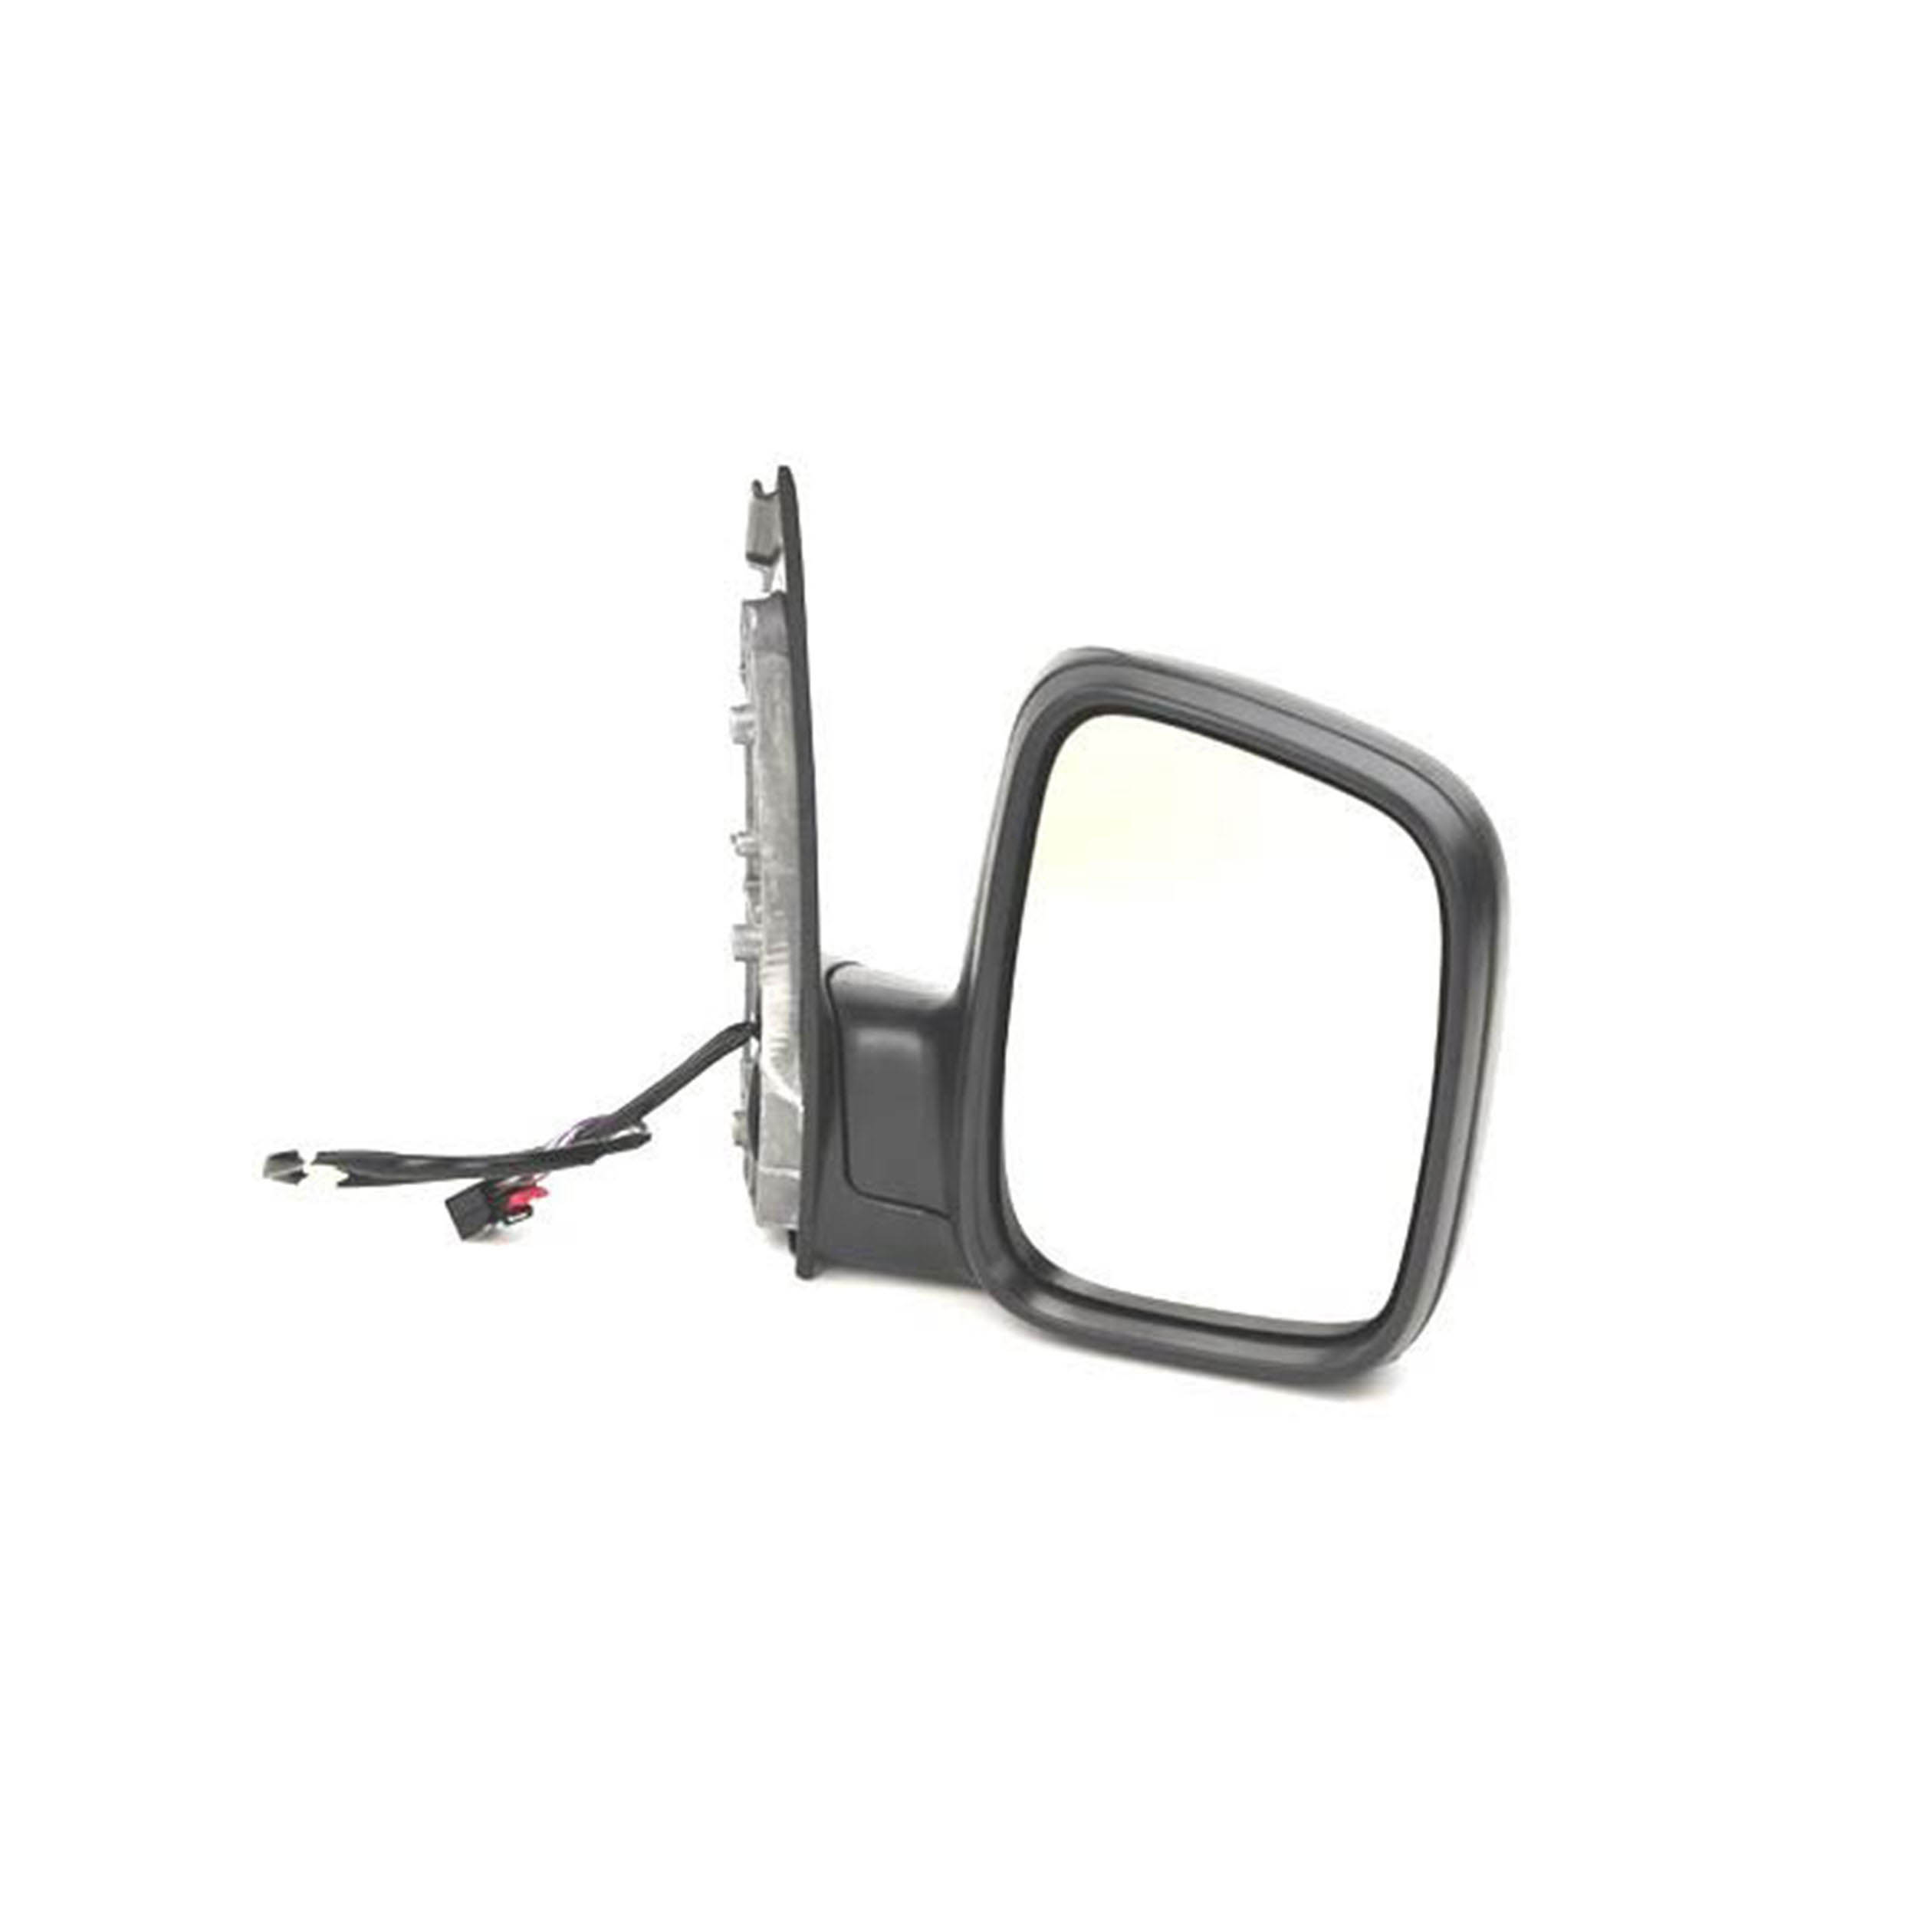 Komple Ayna Sağ - Volkswagen - Caddy 3